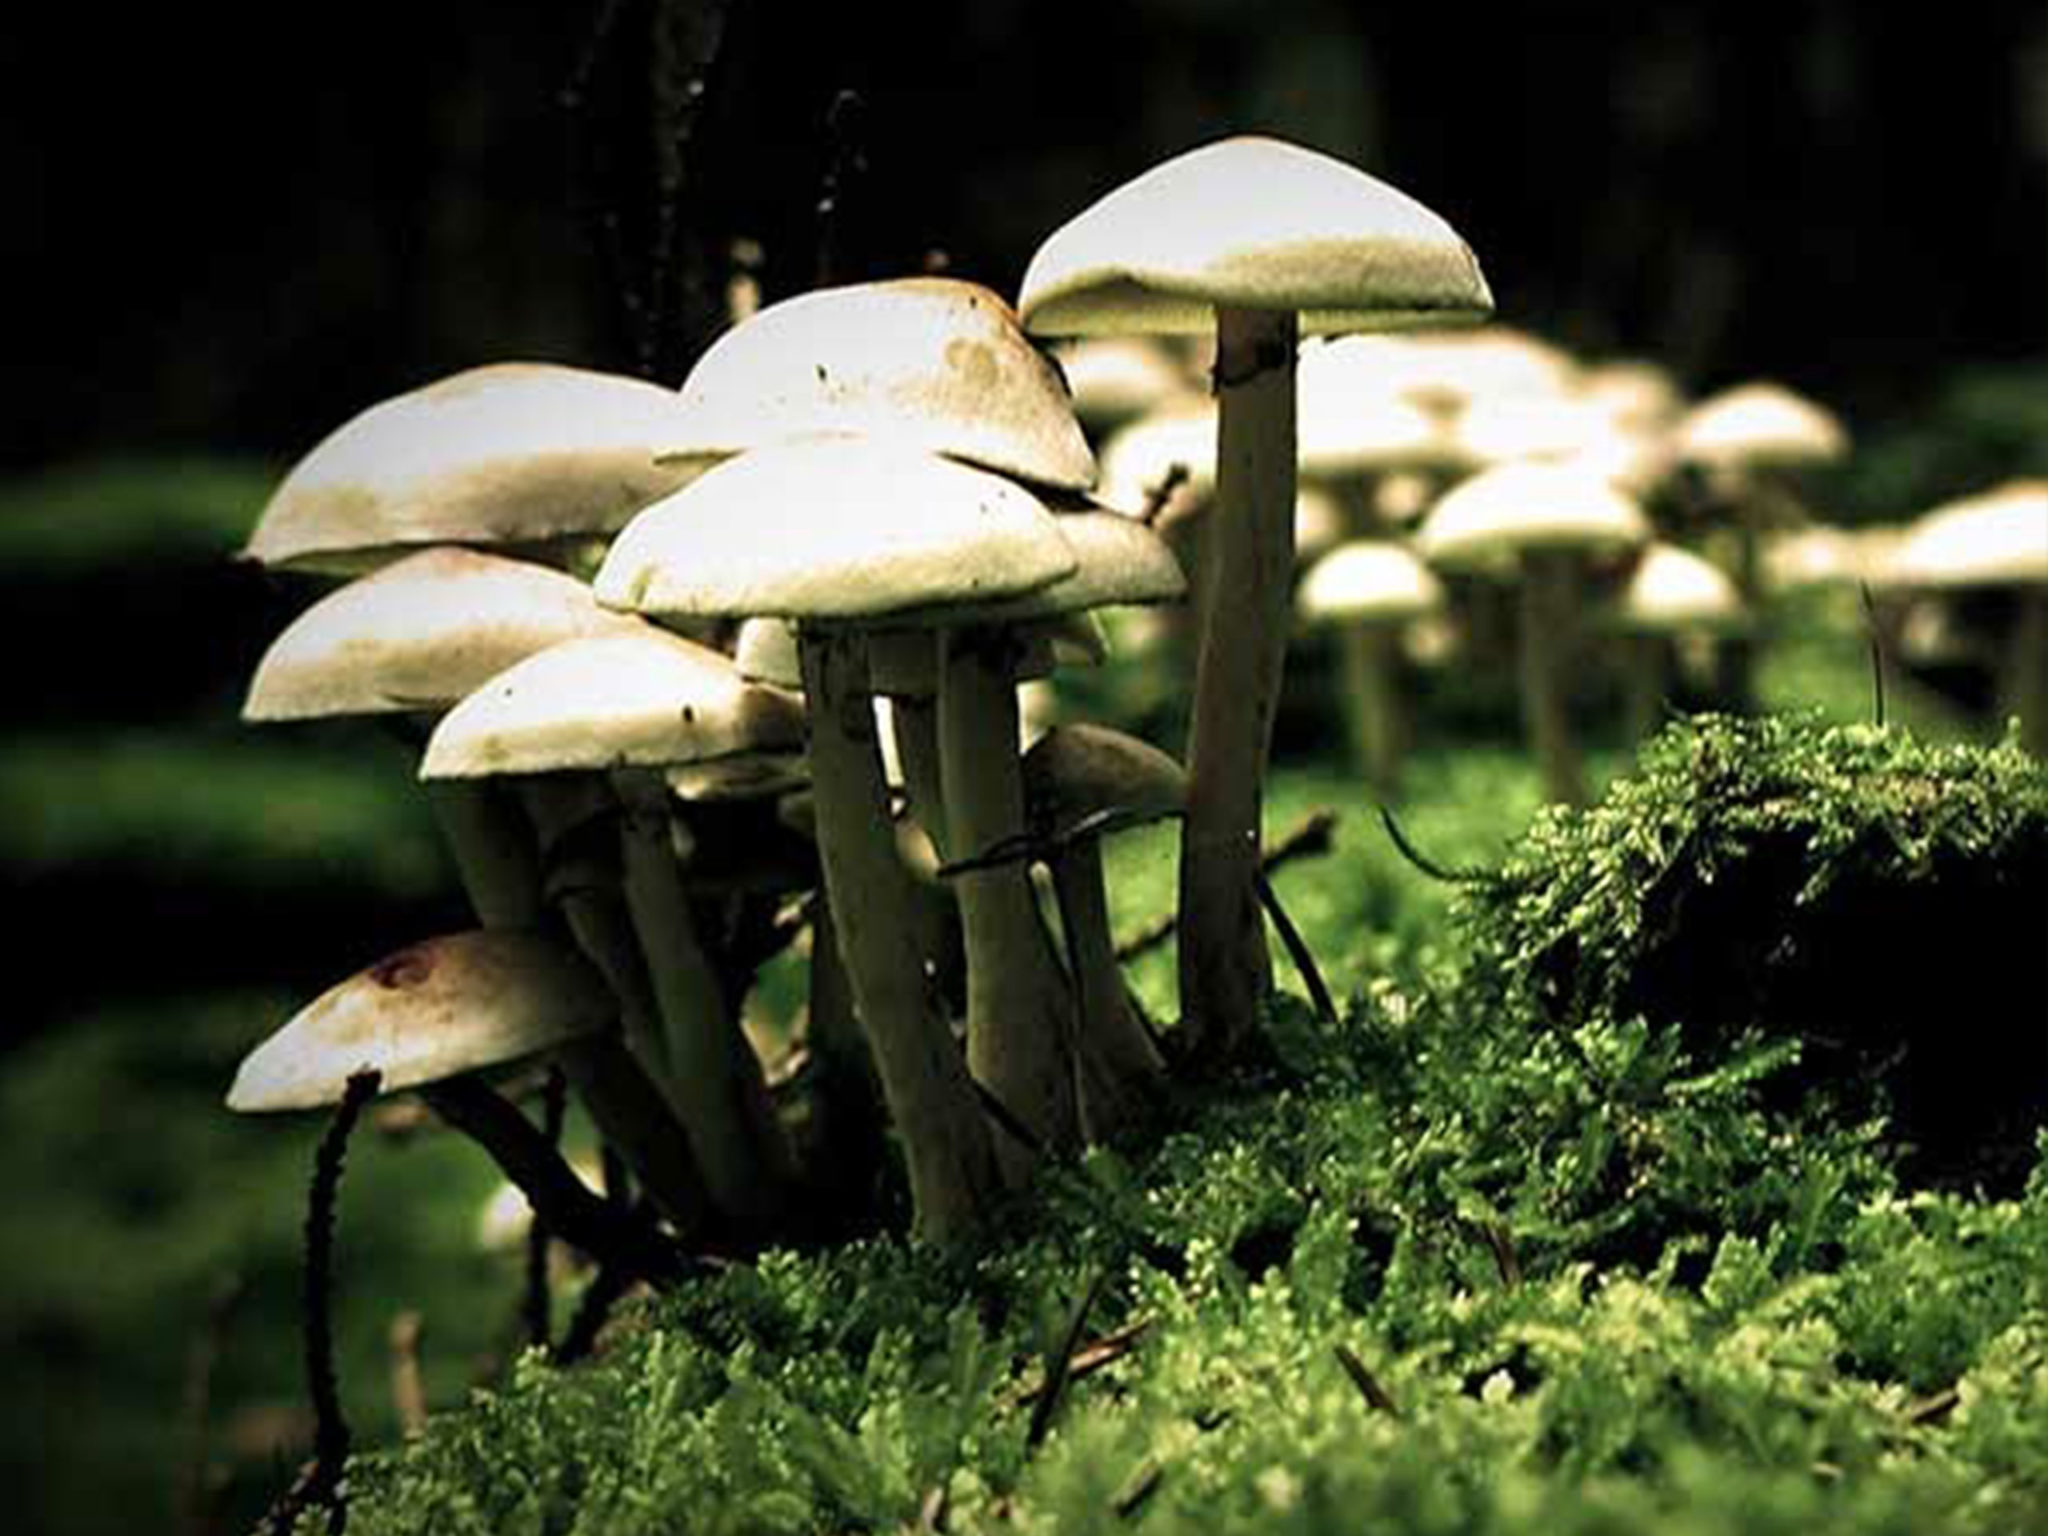 Kojic Fungus Mushroom